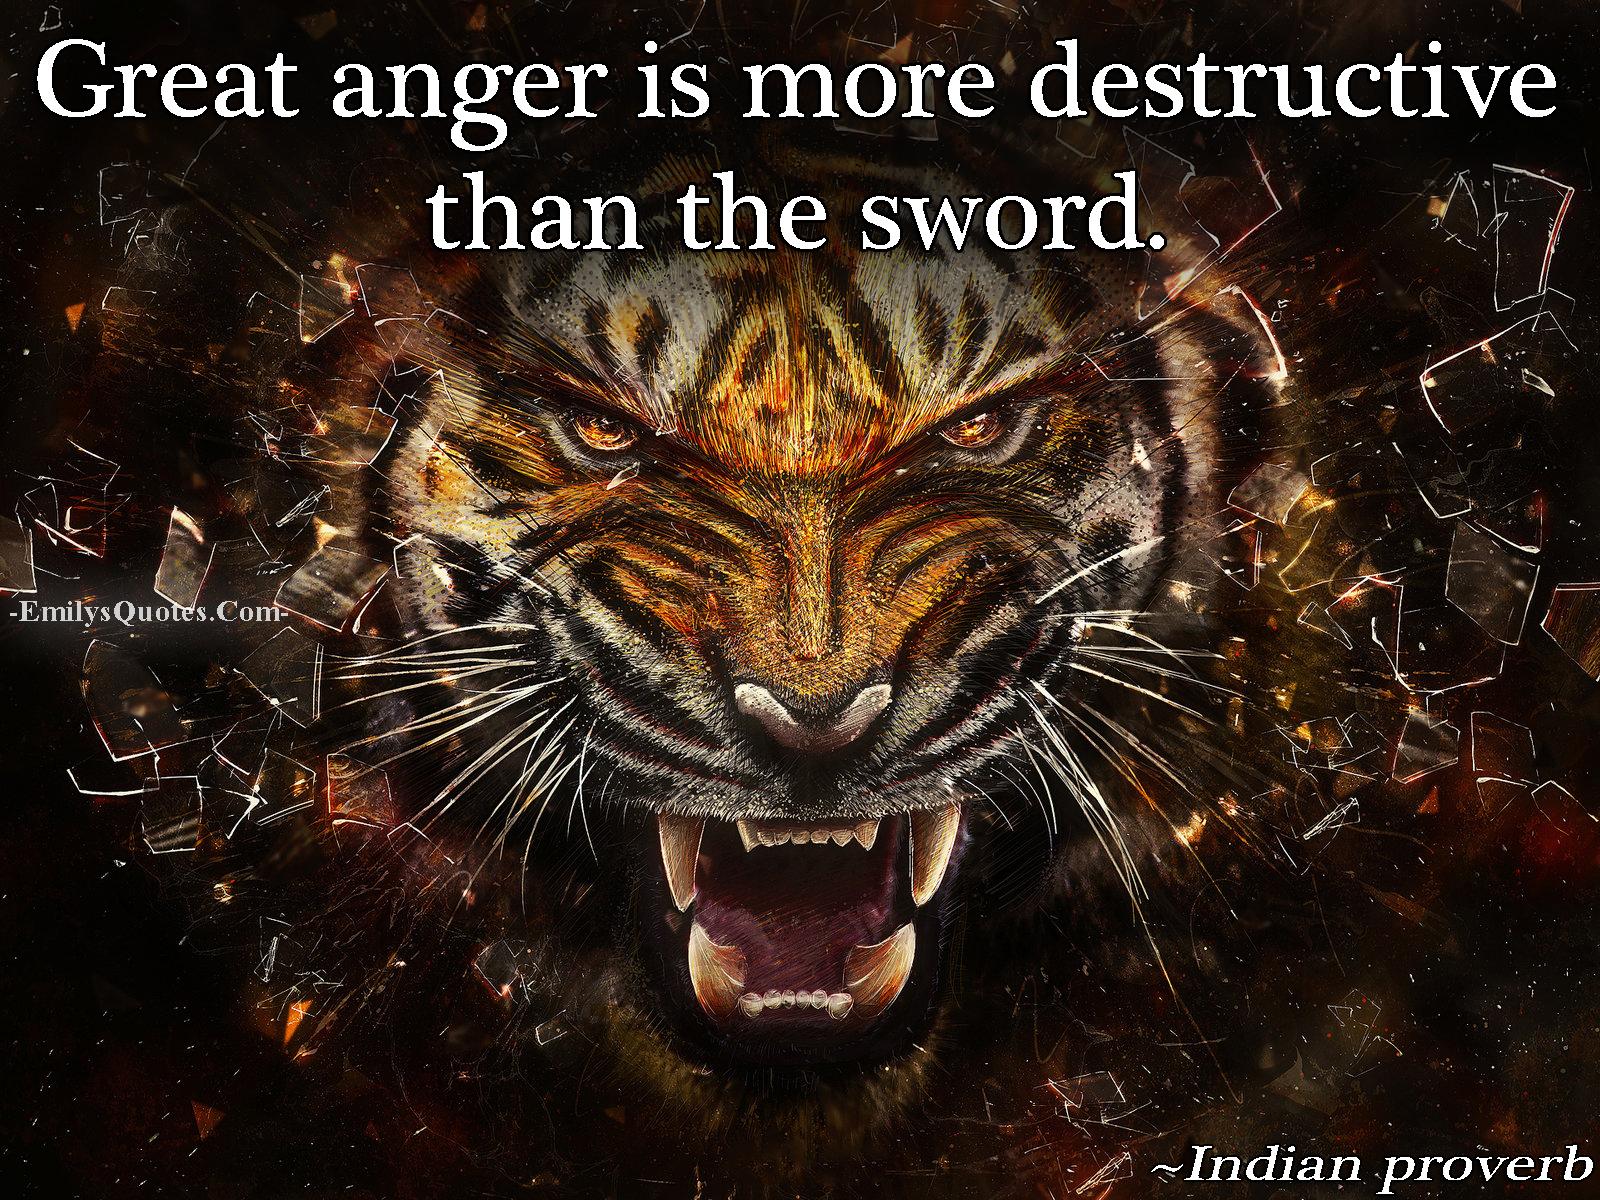 EmilysQuotes.Com - anger, destruction, negative, hate, Indian proverb